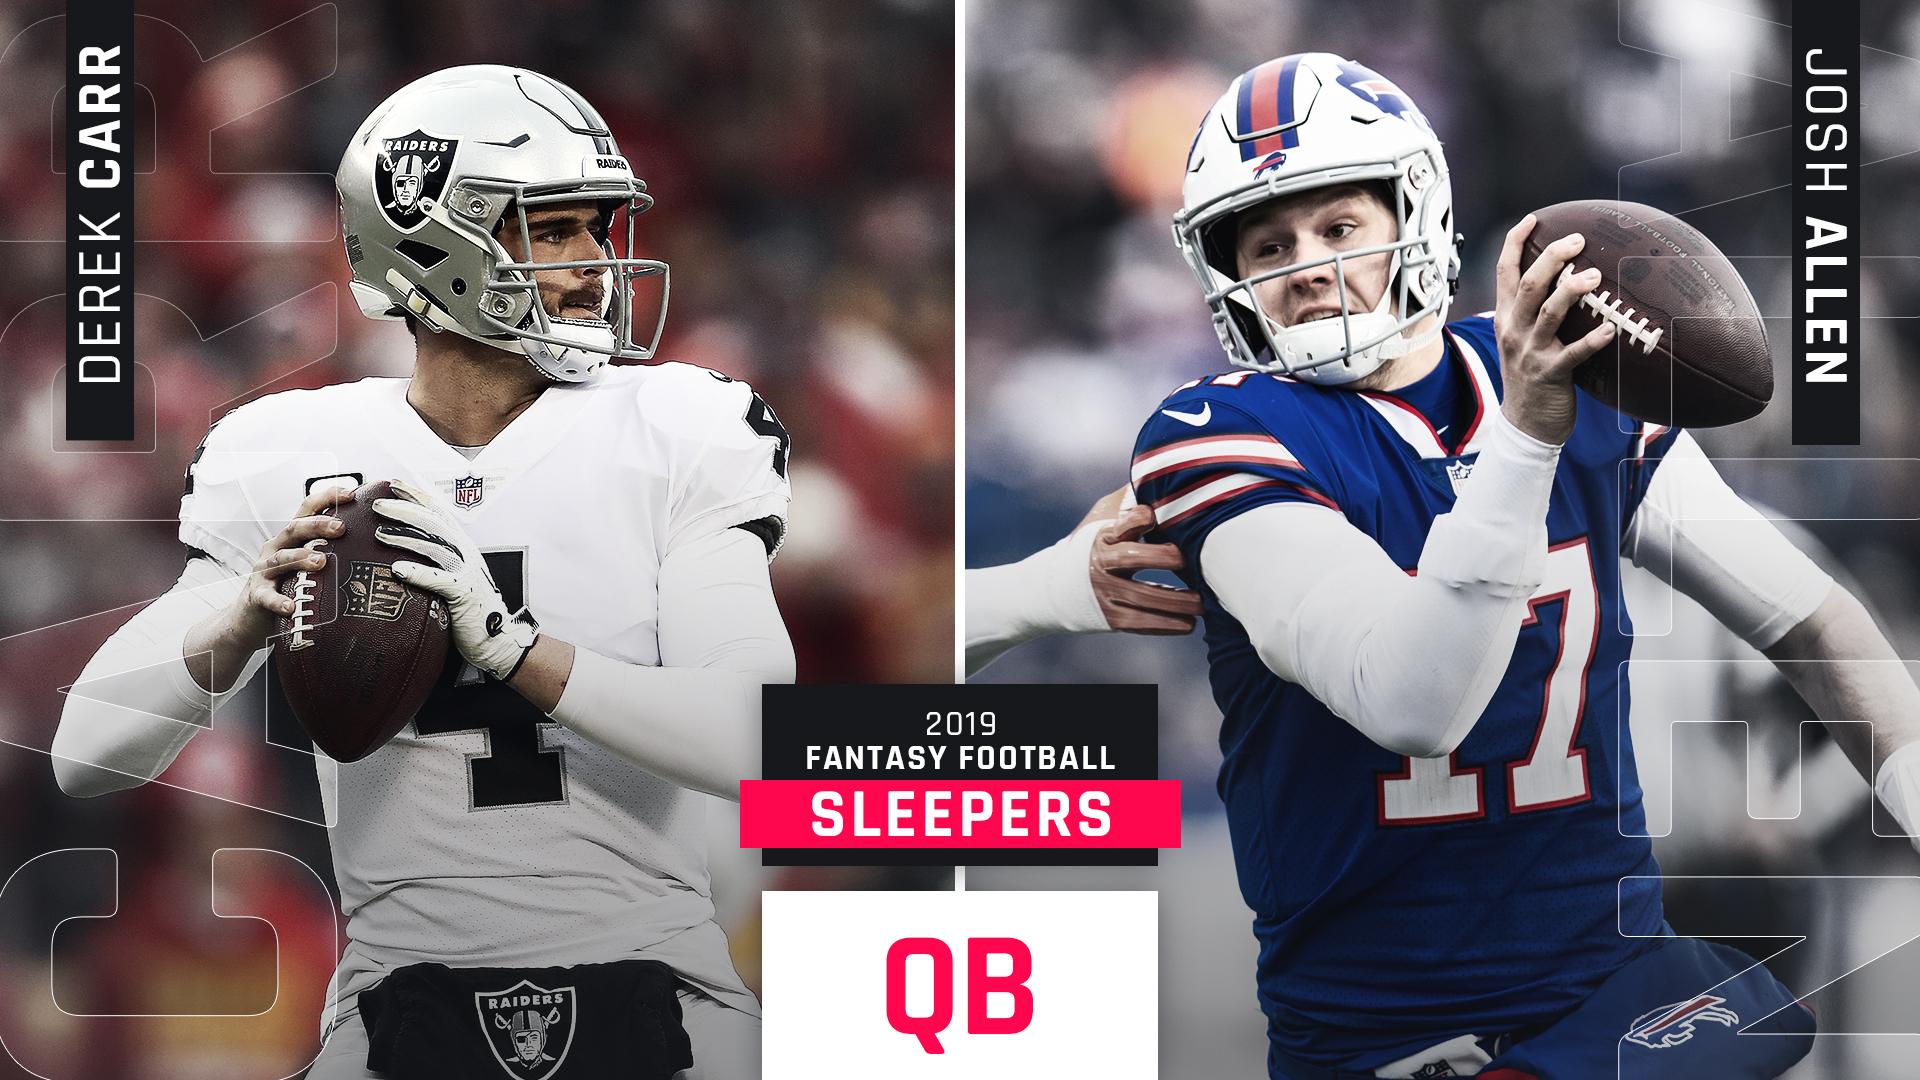 2019 Fantasy Sleepers: Quarterbacks